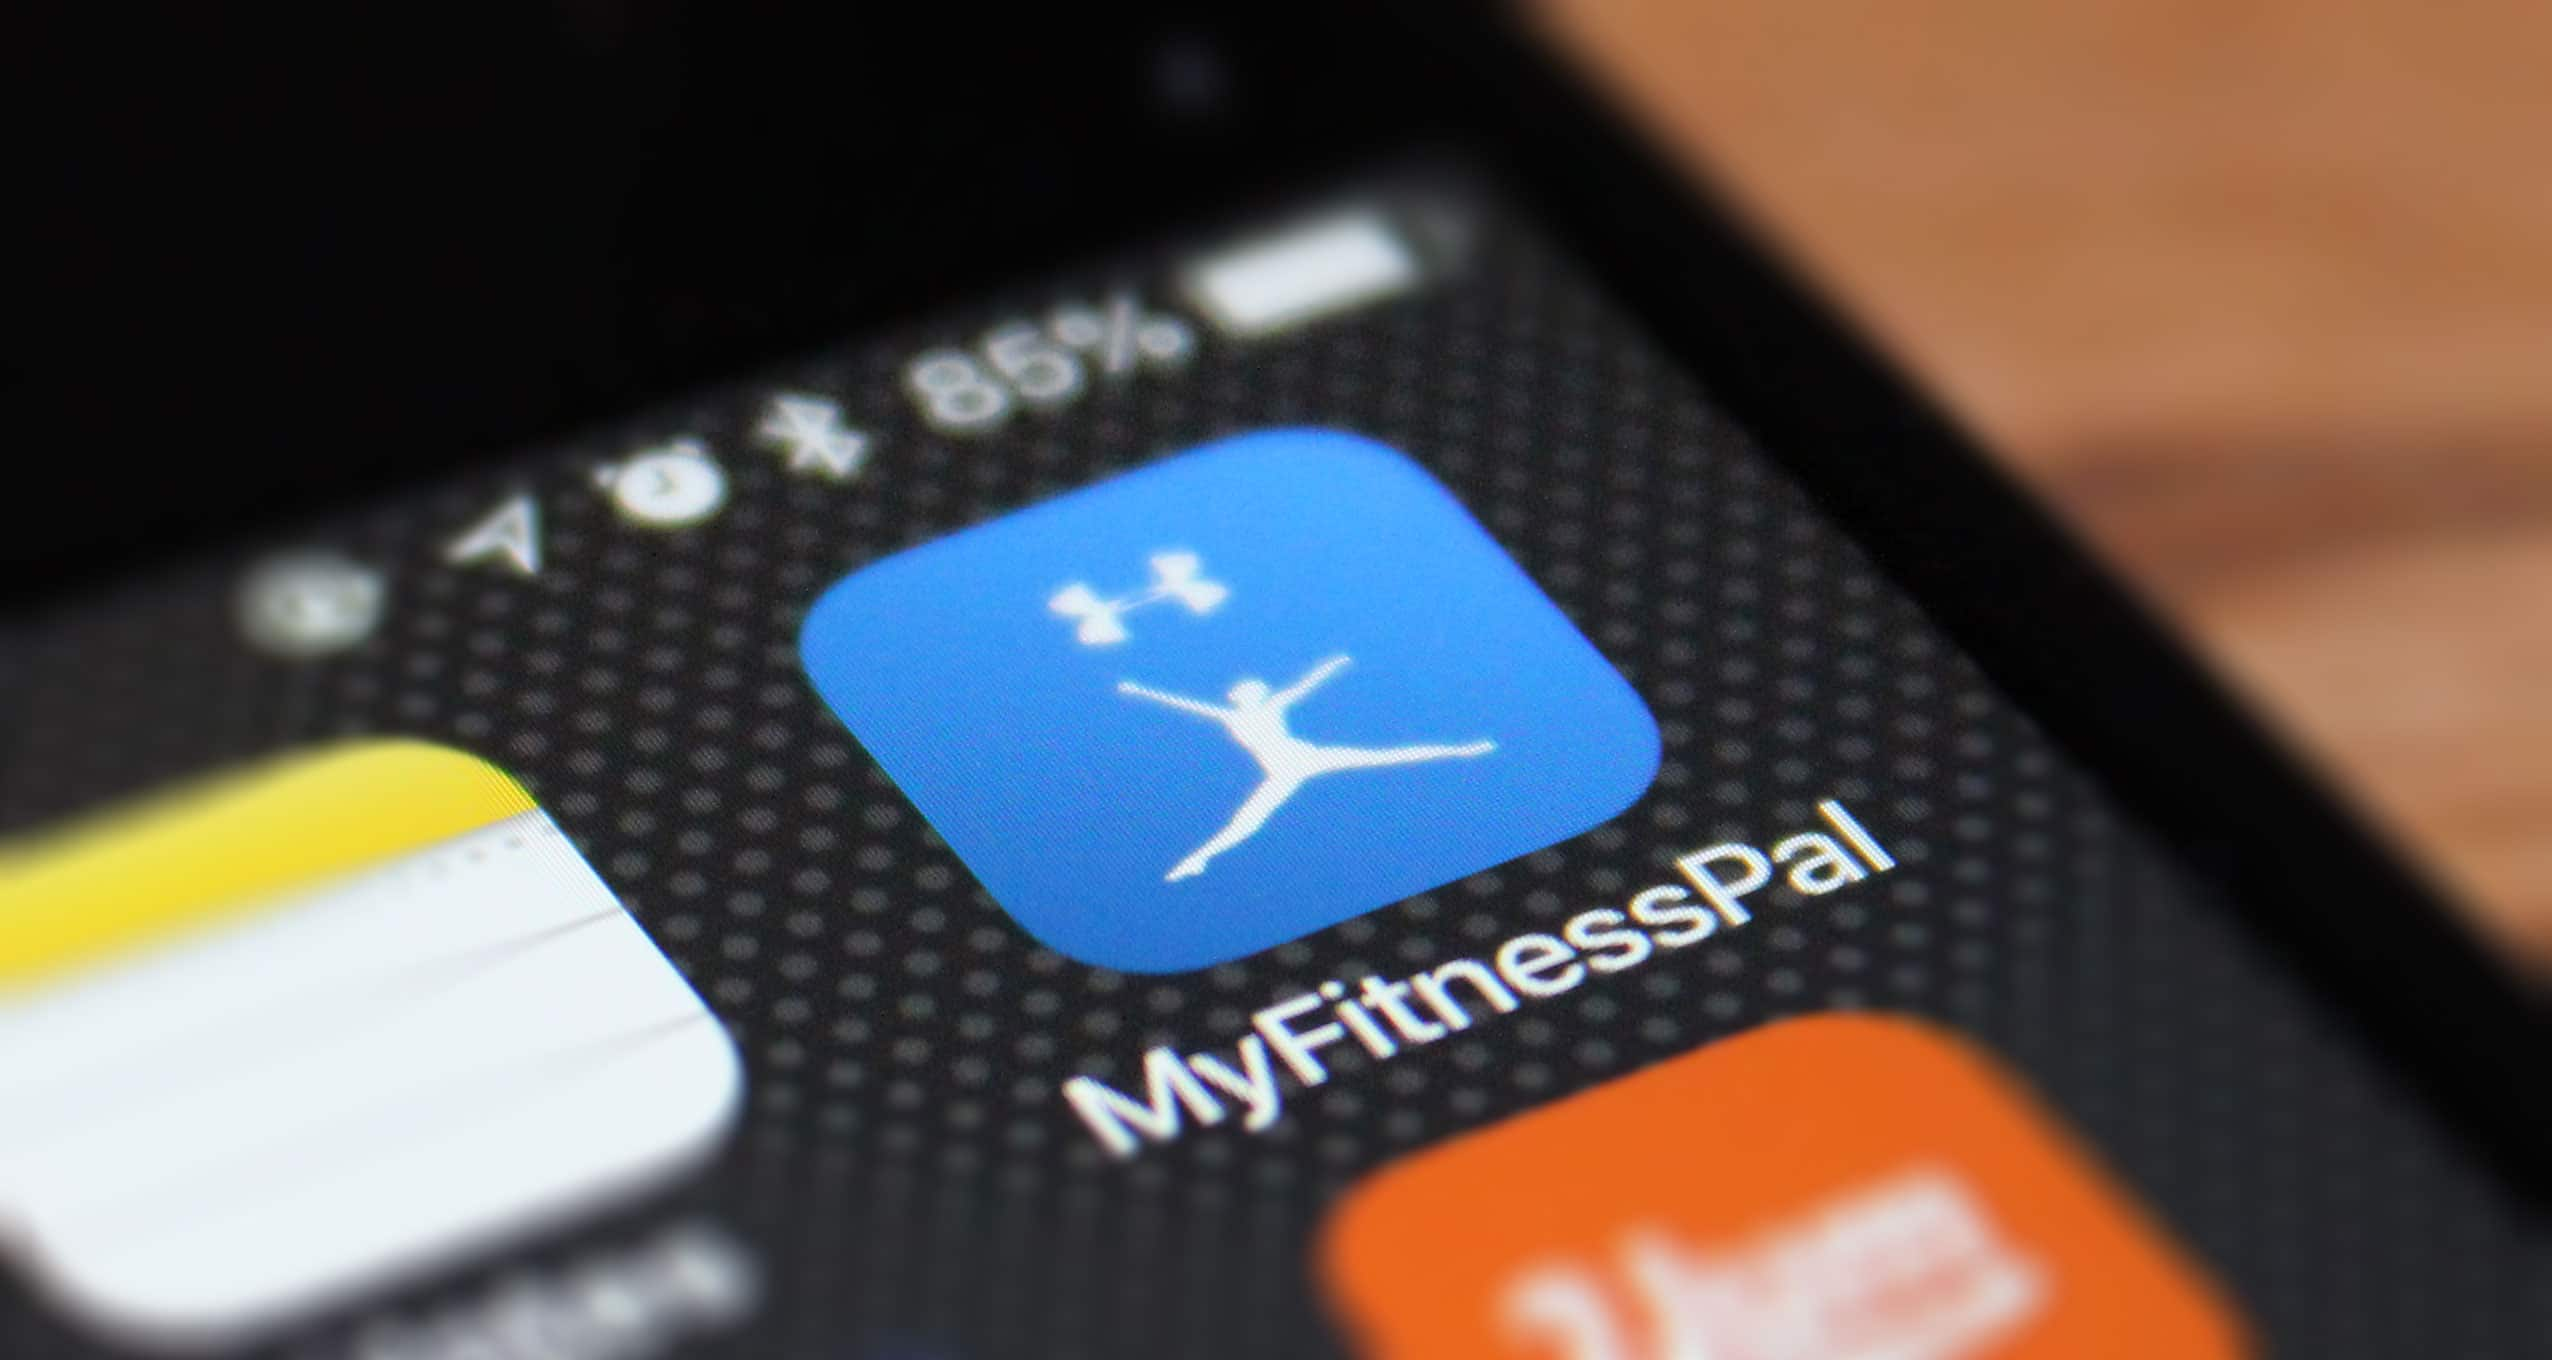 150 Million MyFitnessPal Accounts Breached, Says Under Armour